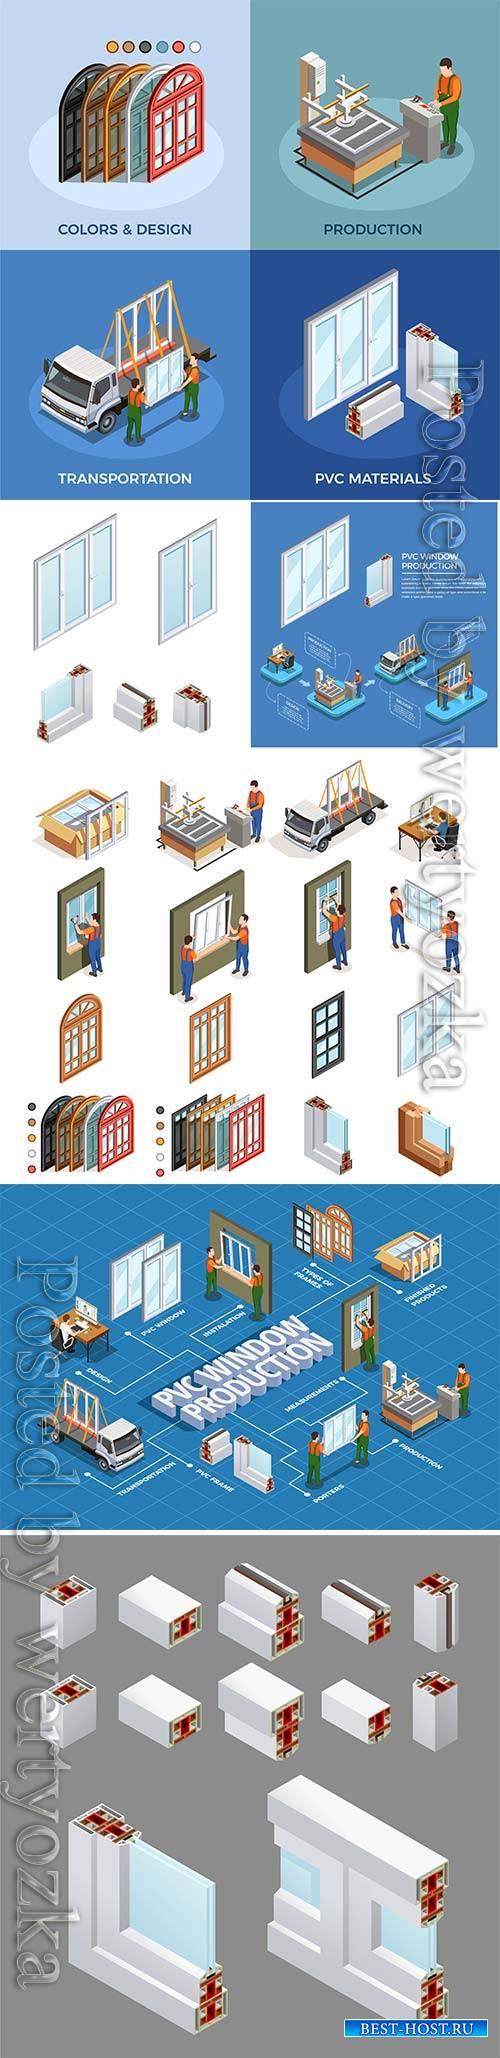 Pvc windows production and transportation